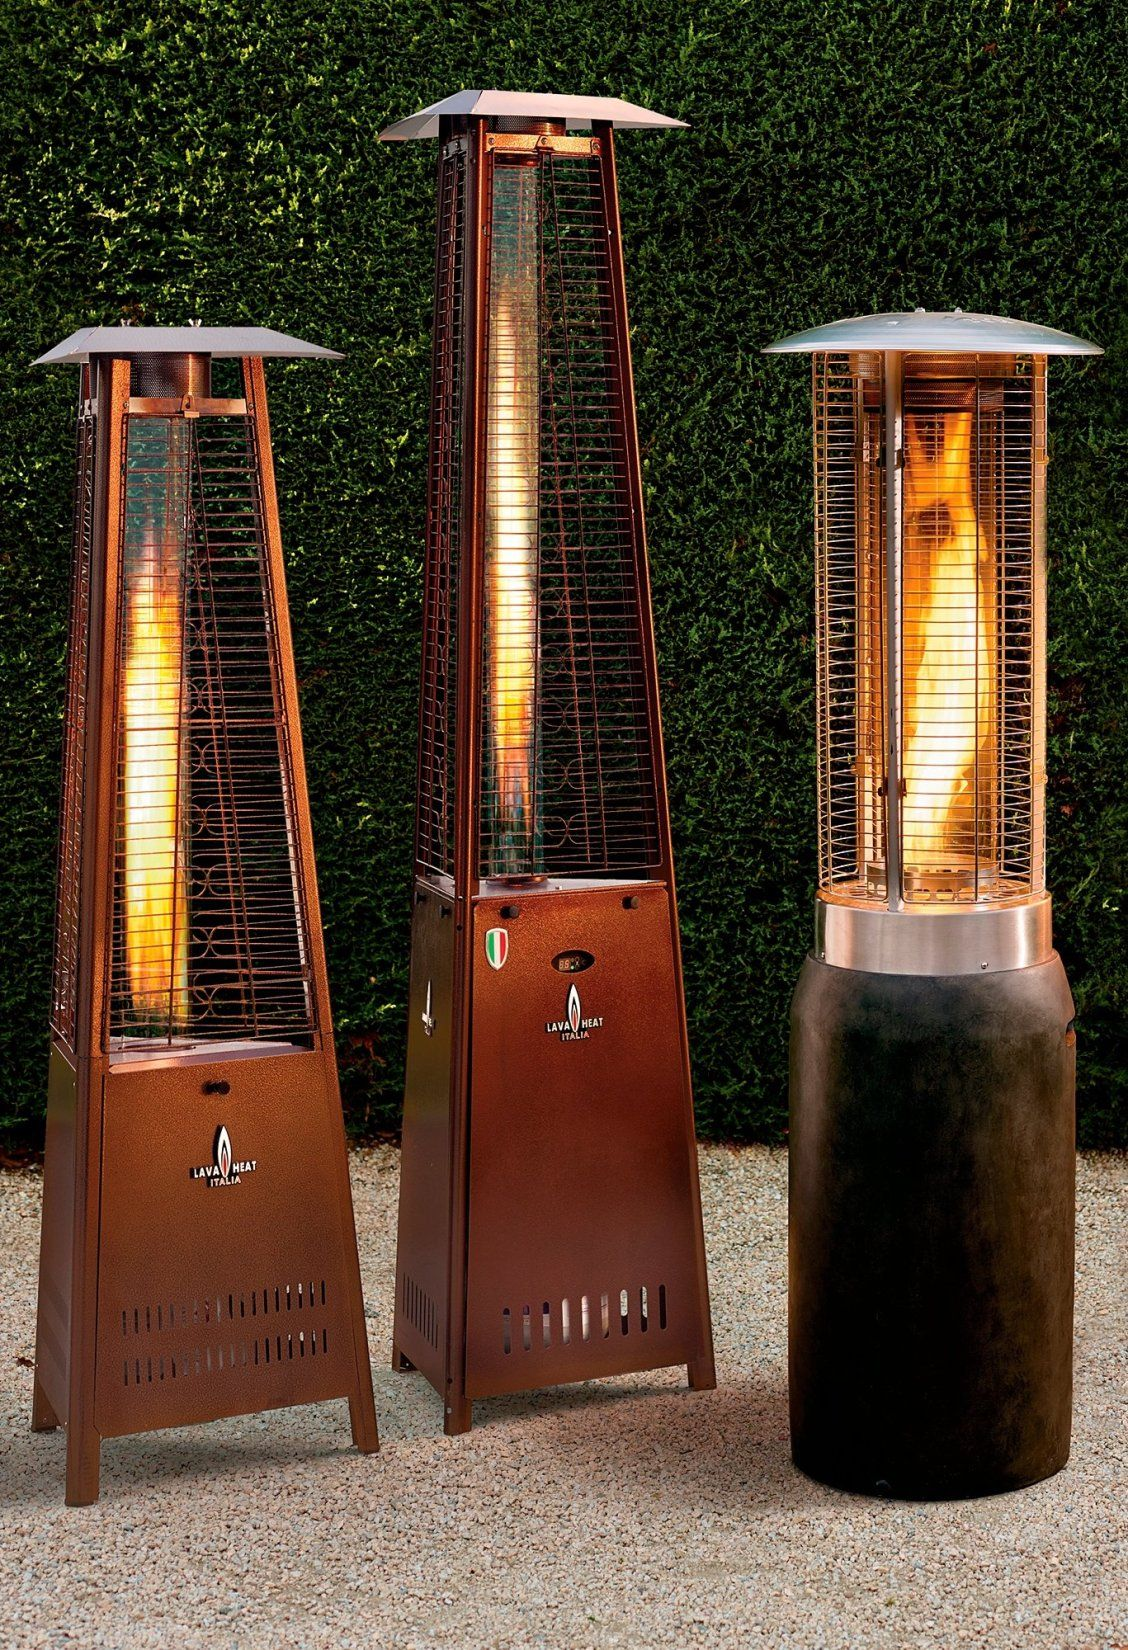 Nova Patio Heater Patio Heater Heater Patio